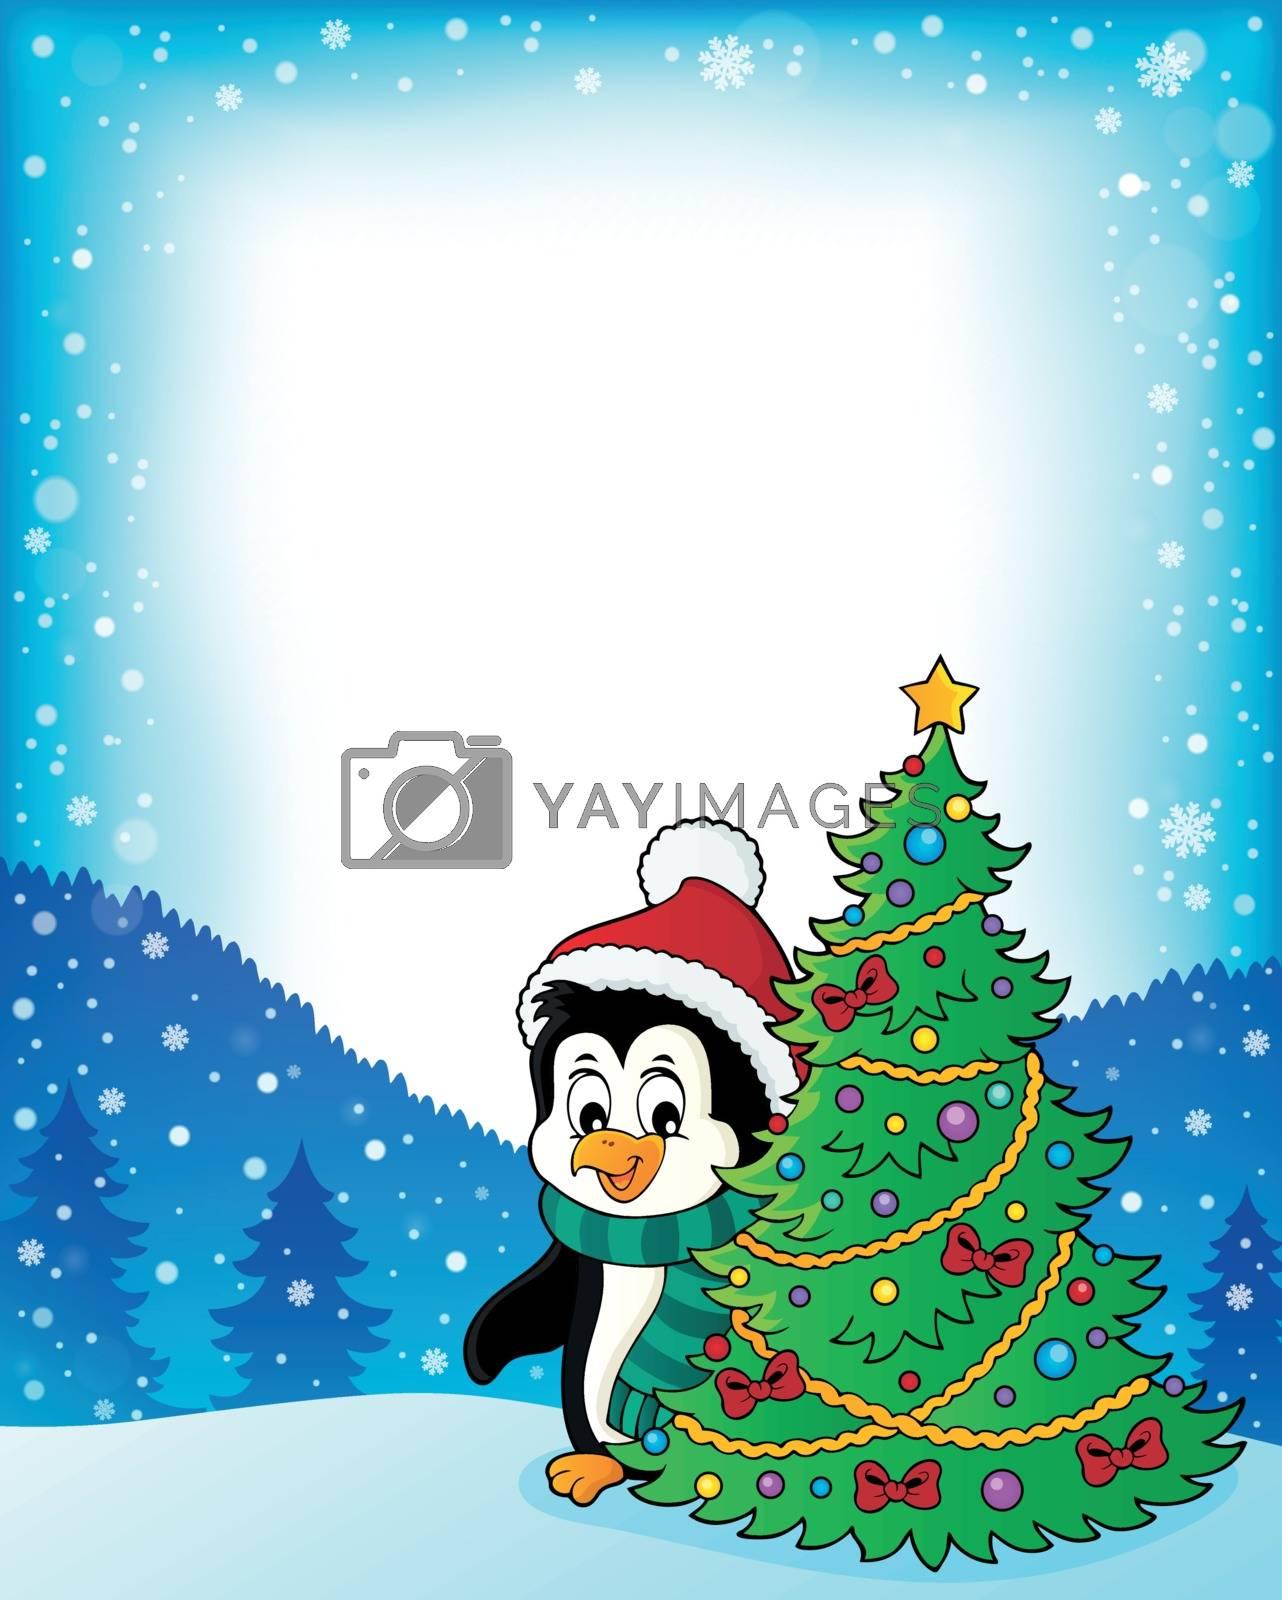 Penguin with Christmas tree frame 1 - eps10 vector illustration.